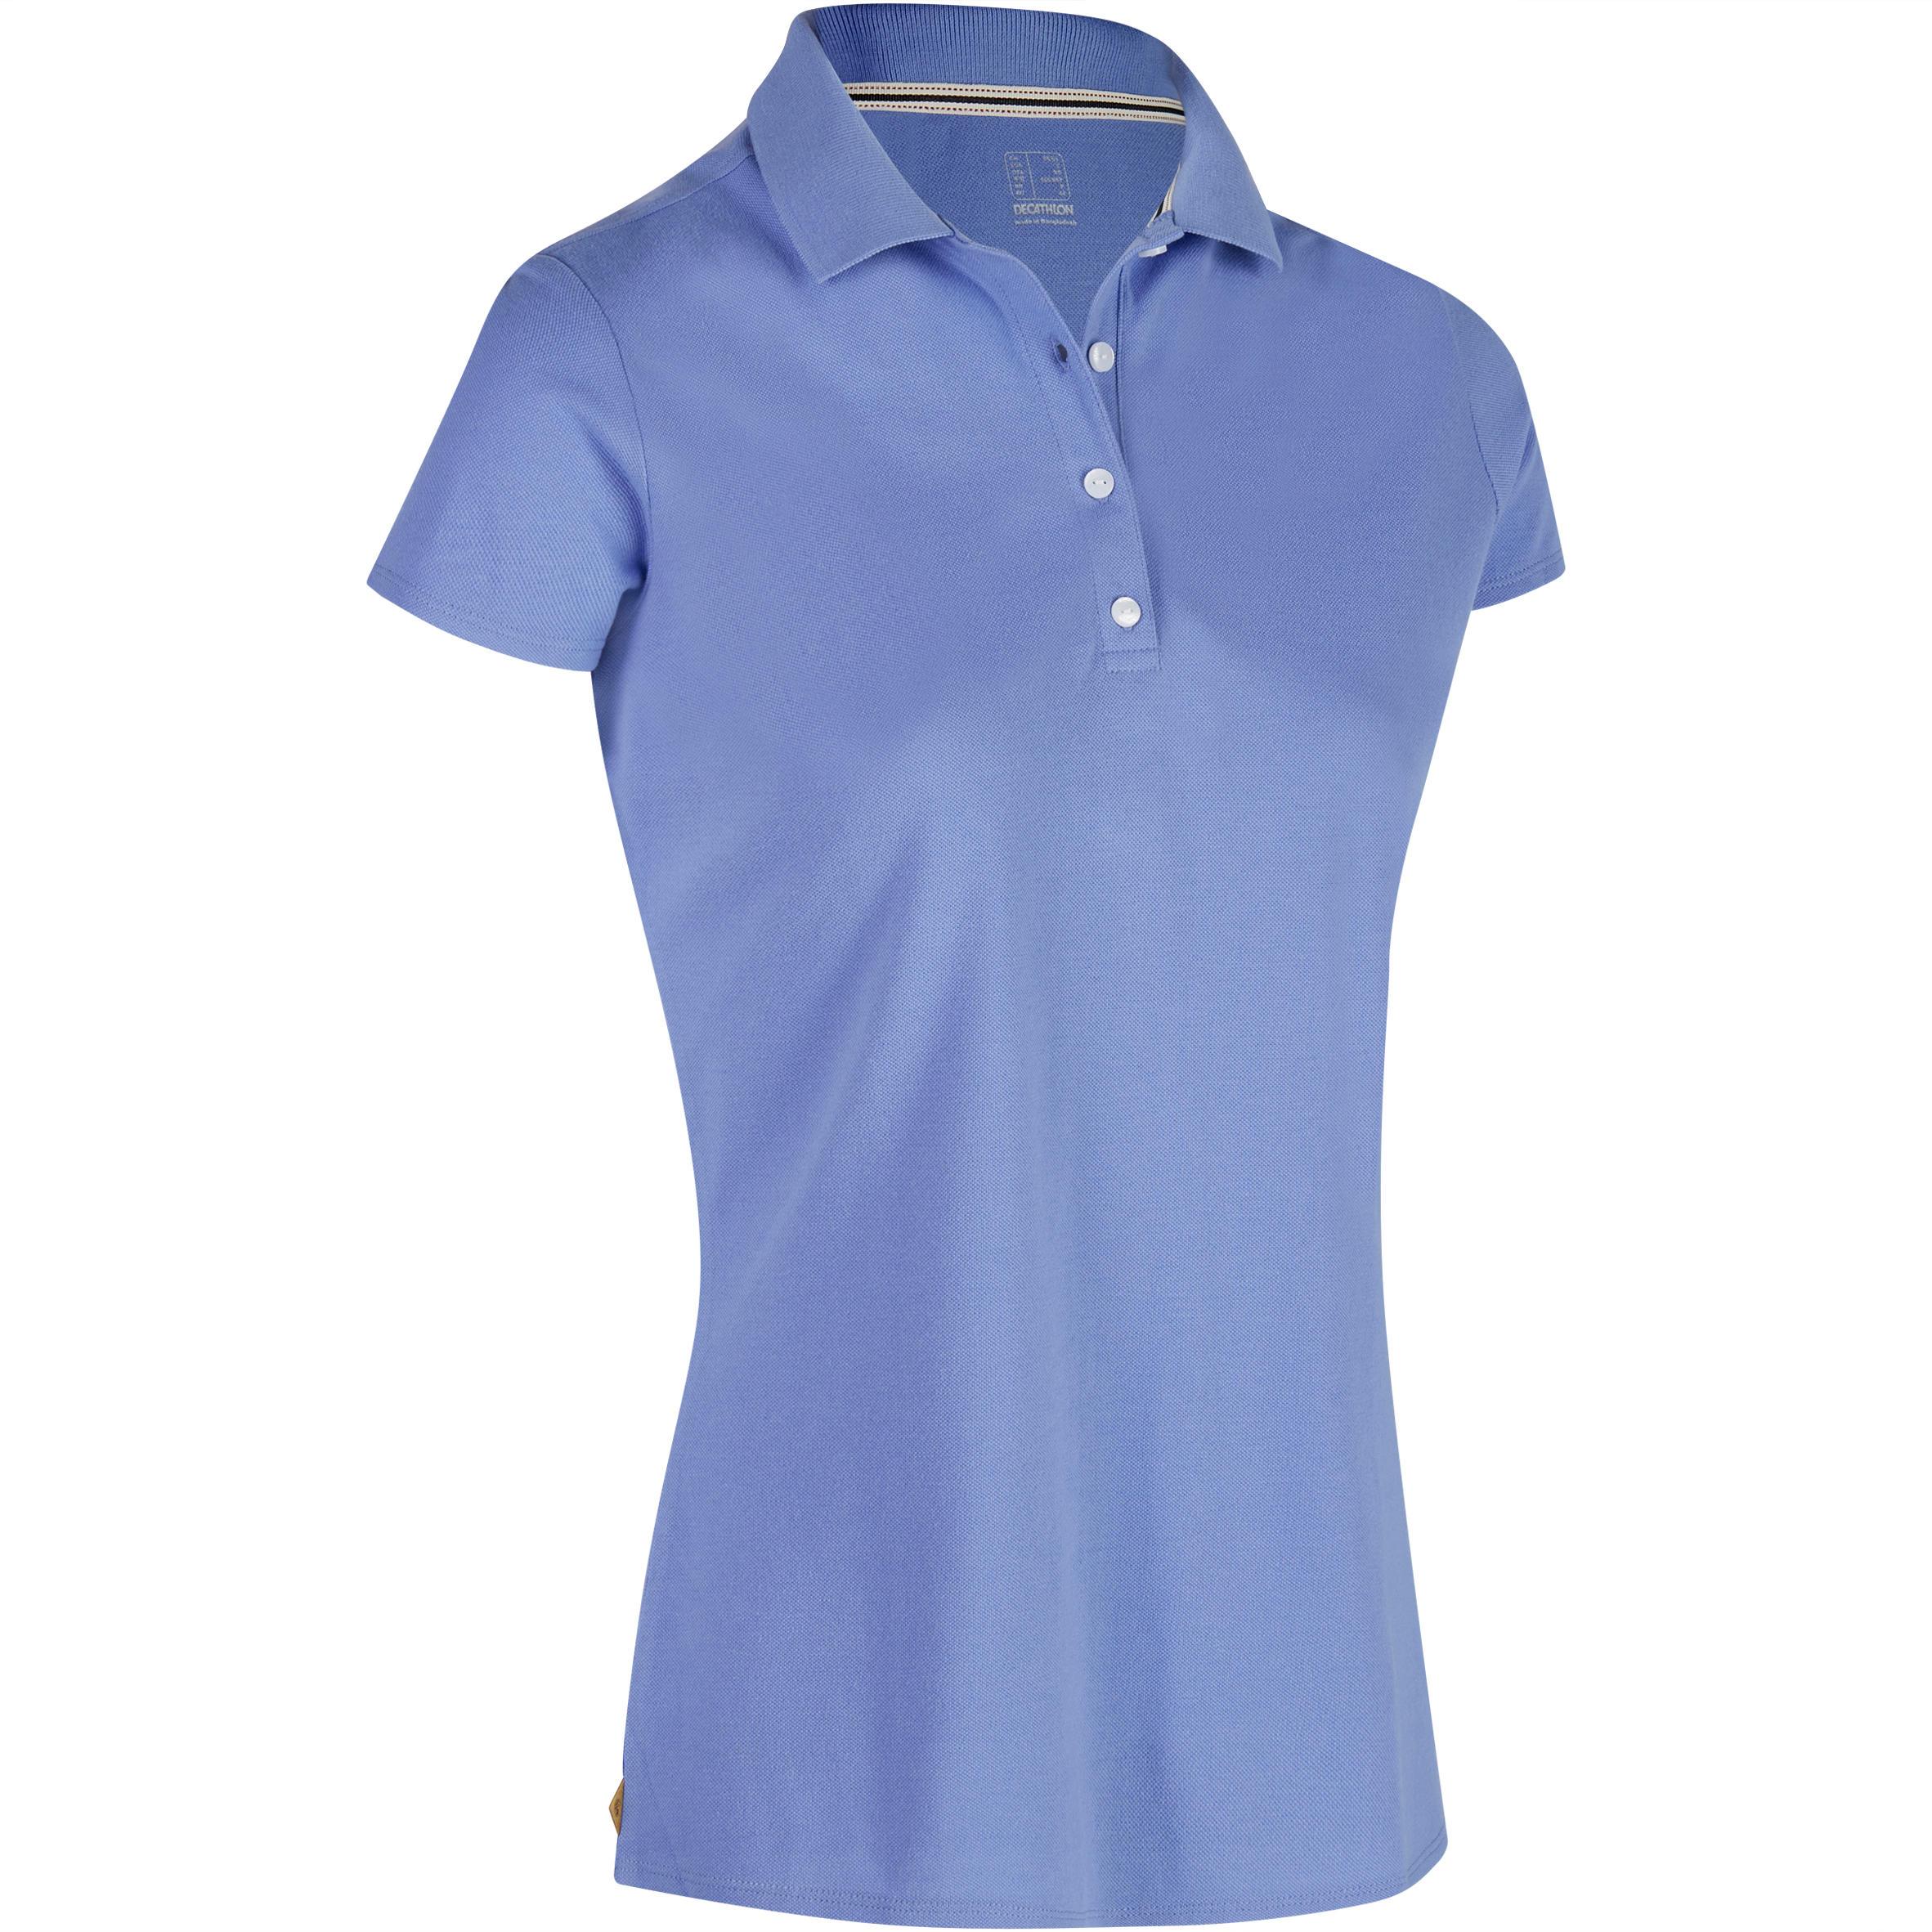 Polo de golf mujer manga corta 500 - clima caluroso - azul lavanda